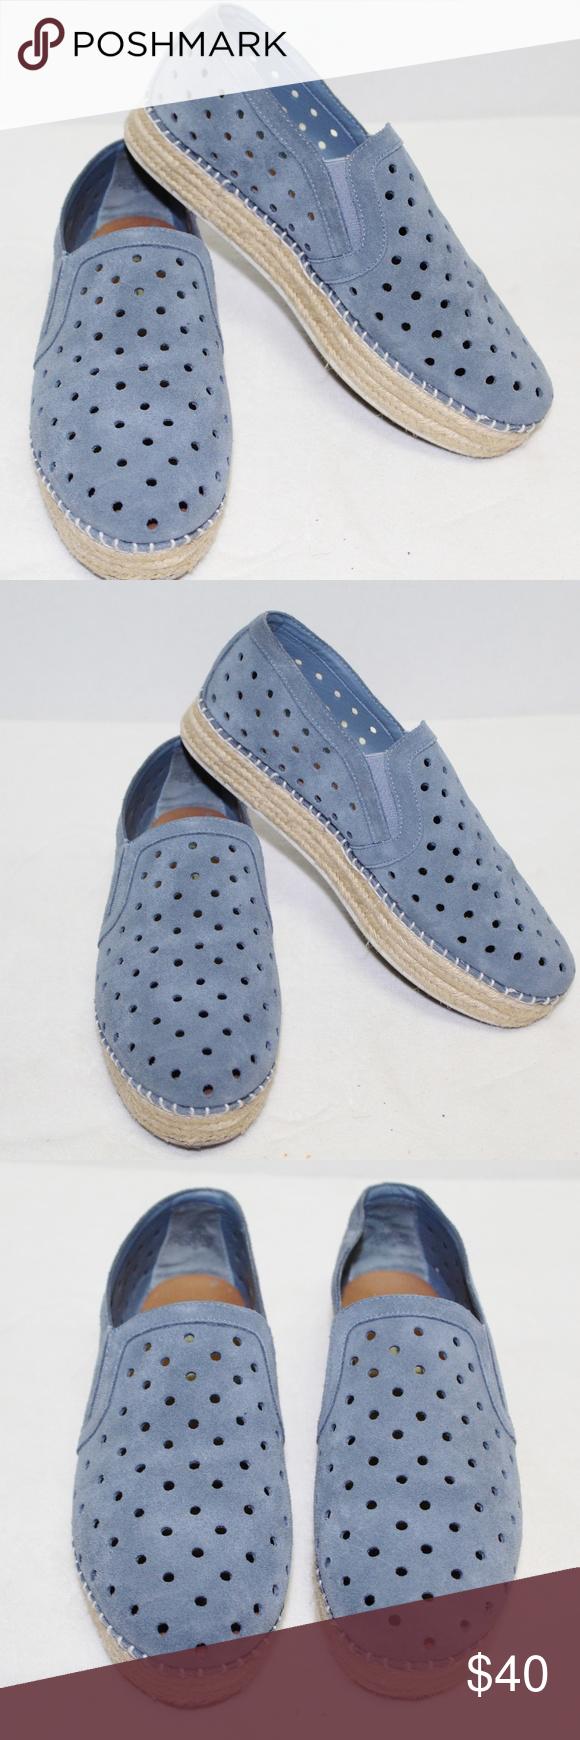 16043715860 Steve Madden widmer blue suede espadrille sneakers Steve Madden ...